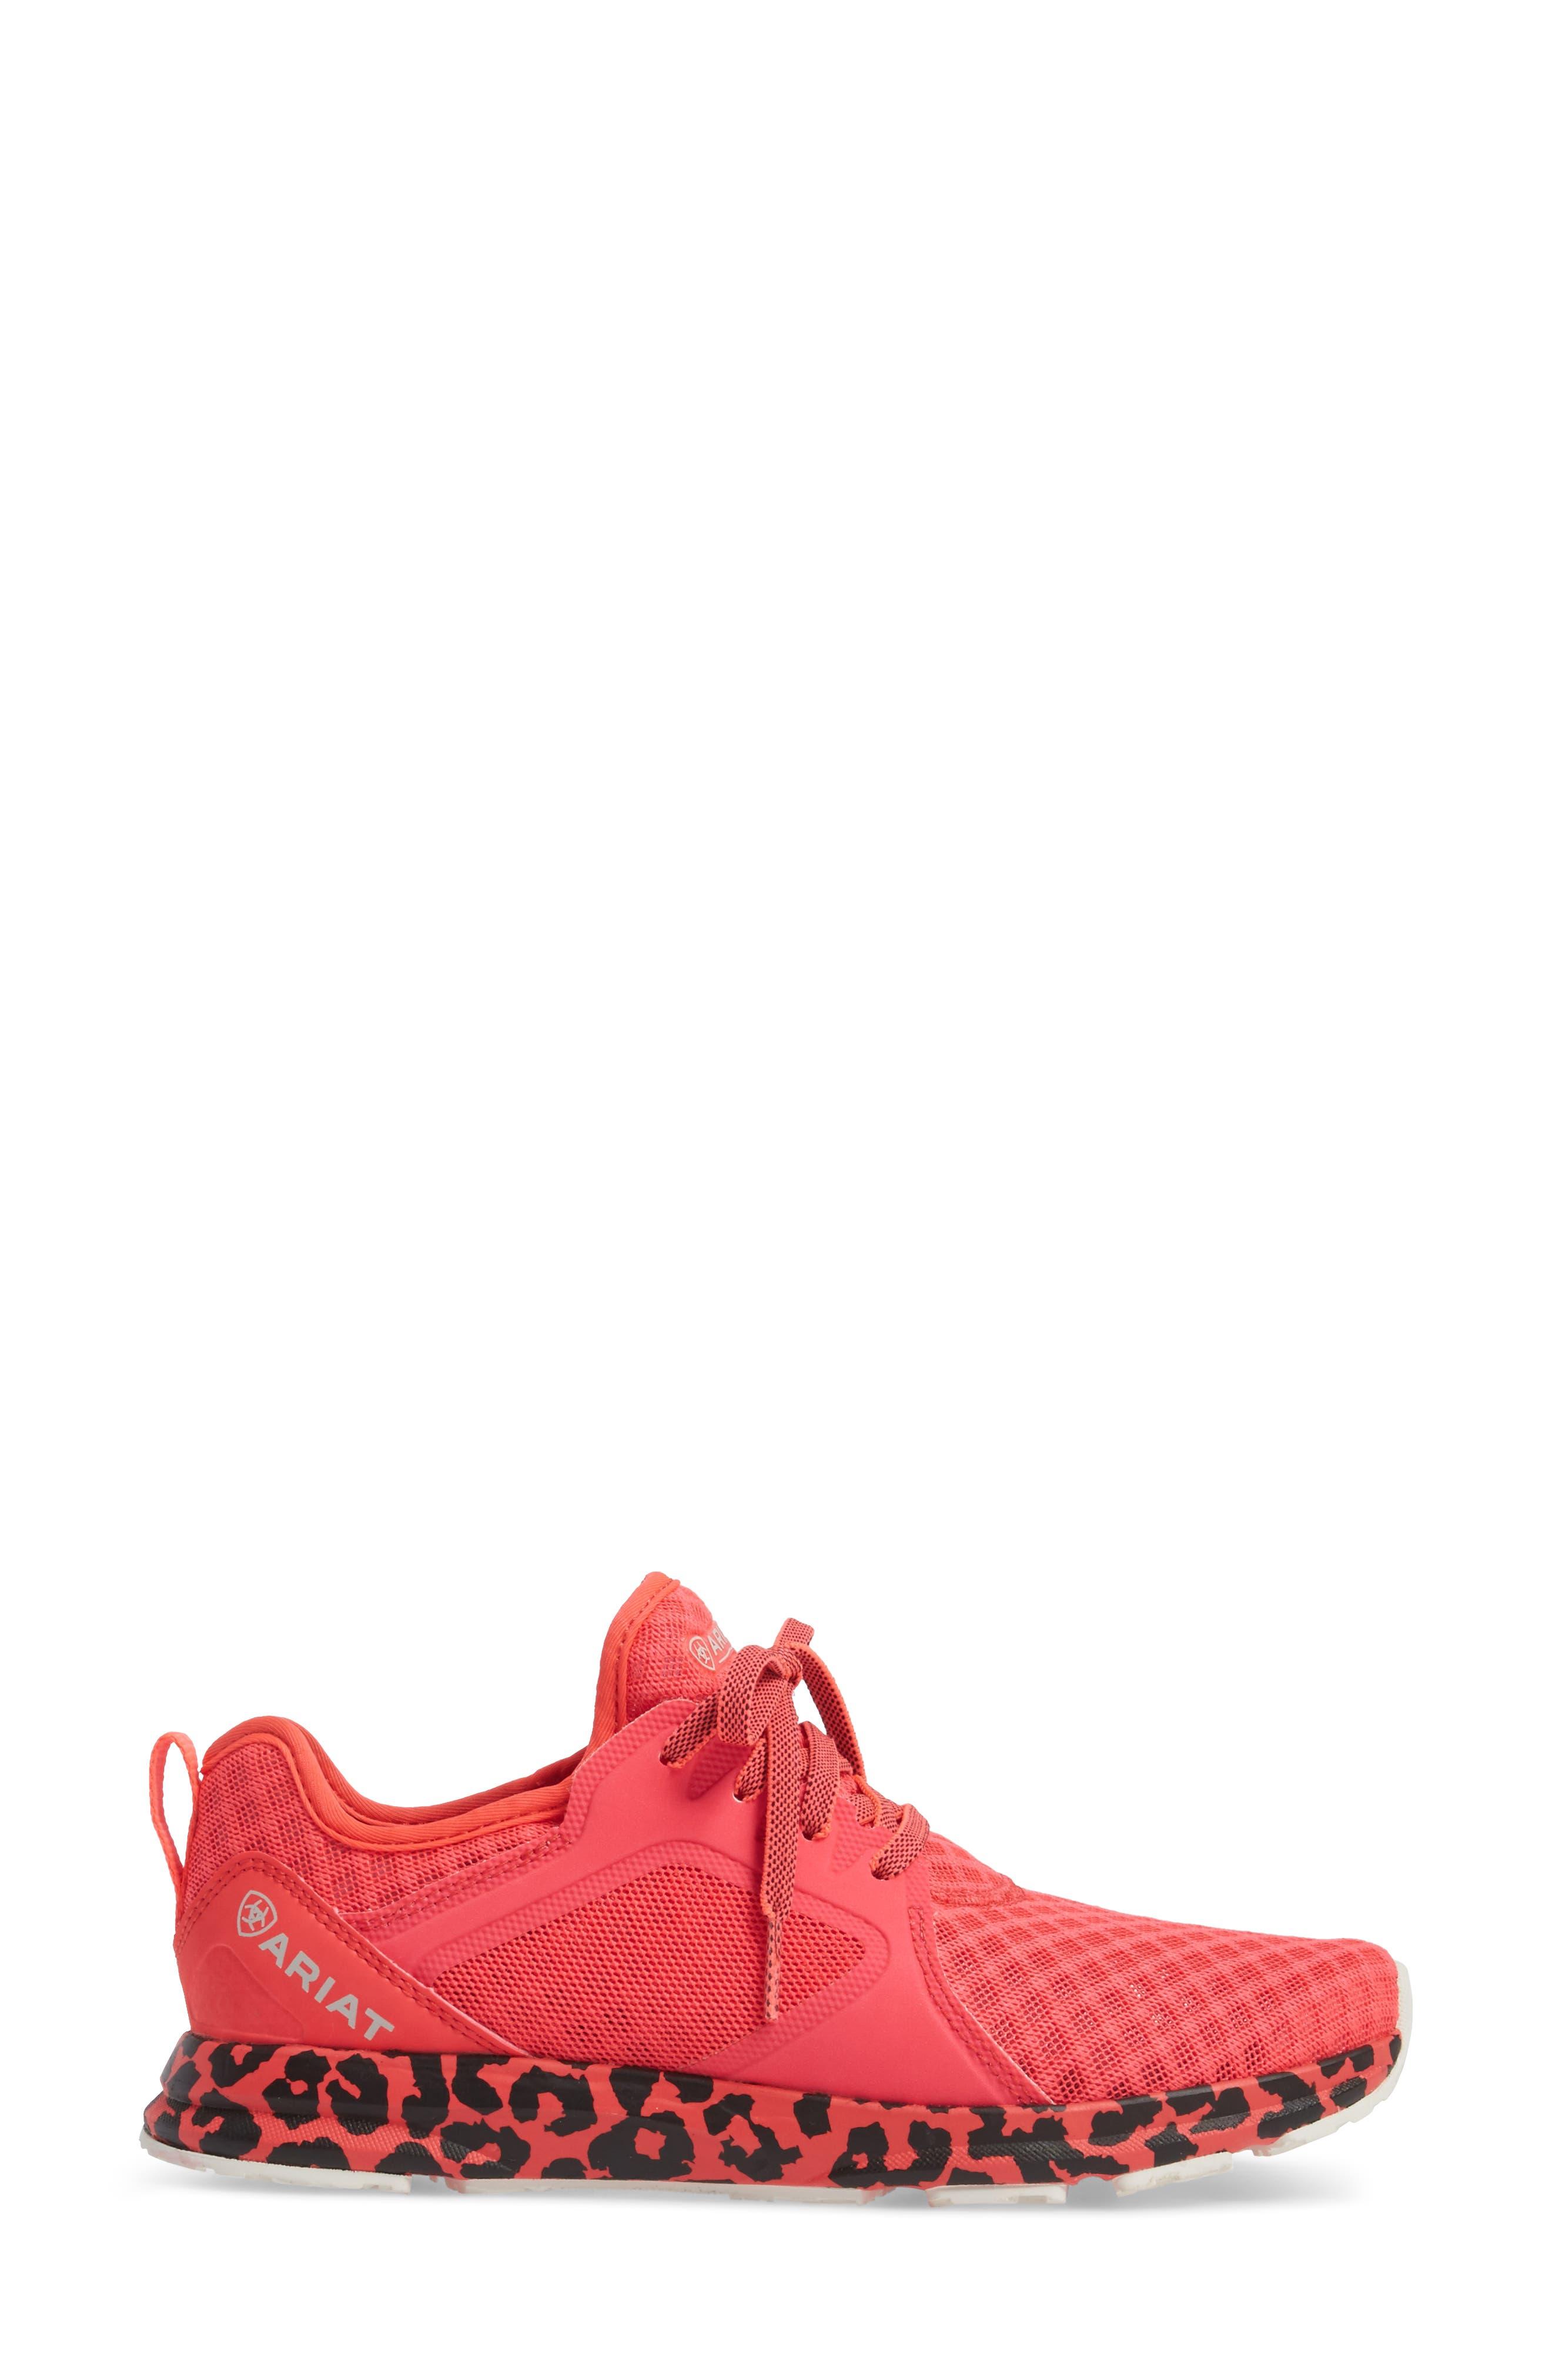 Alternate Image 3  - Ariat Fuse Print Sneaker (Women)